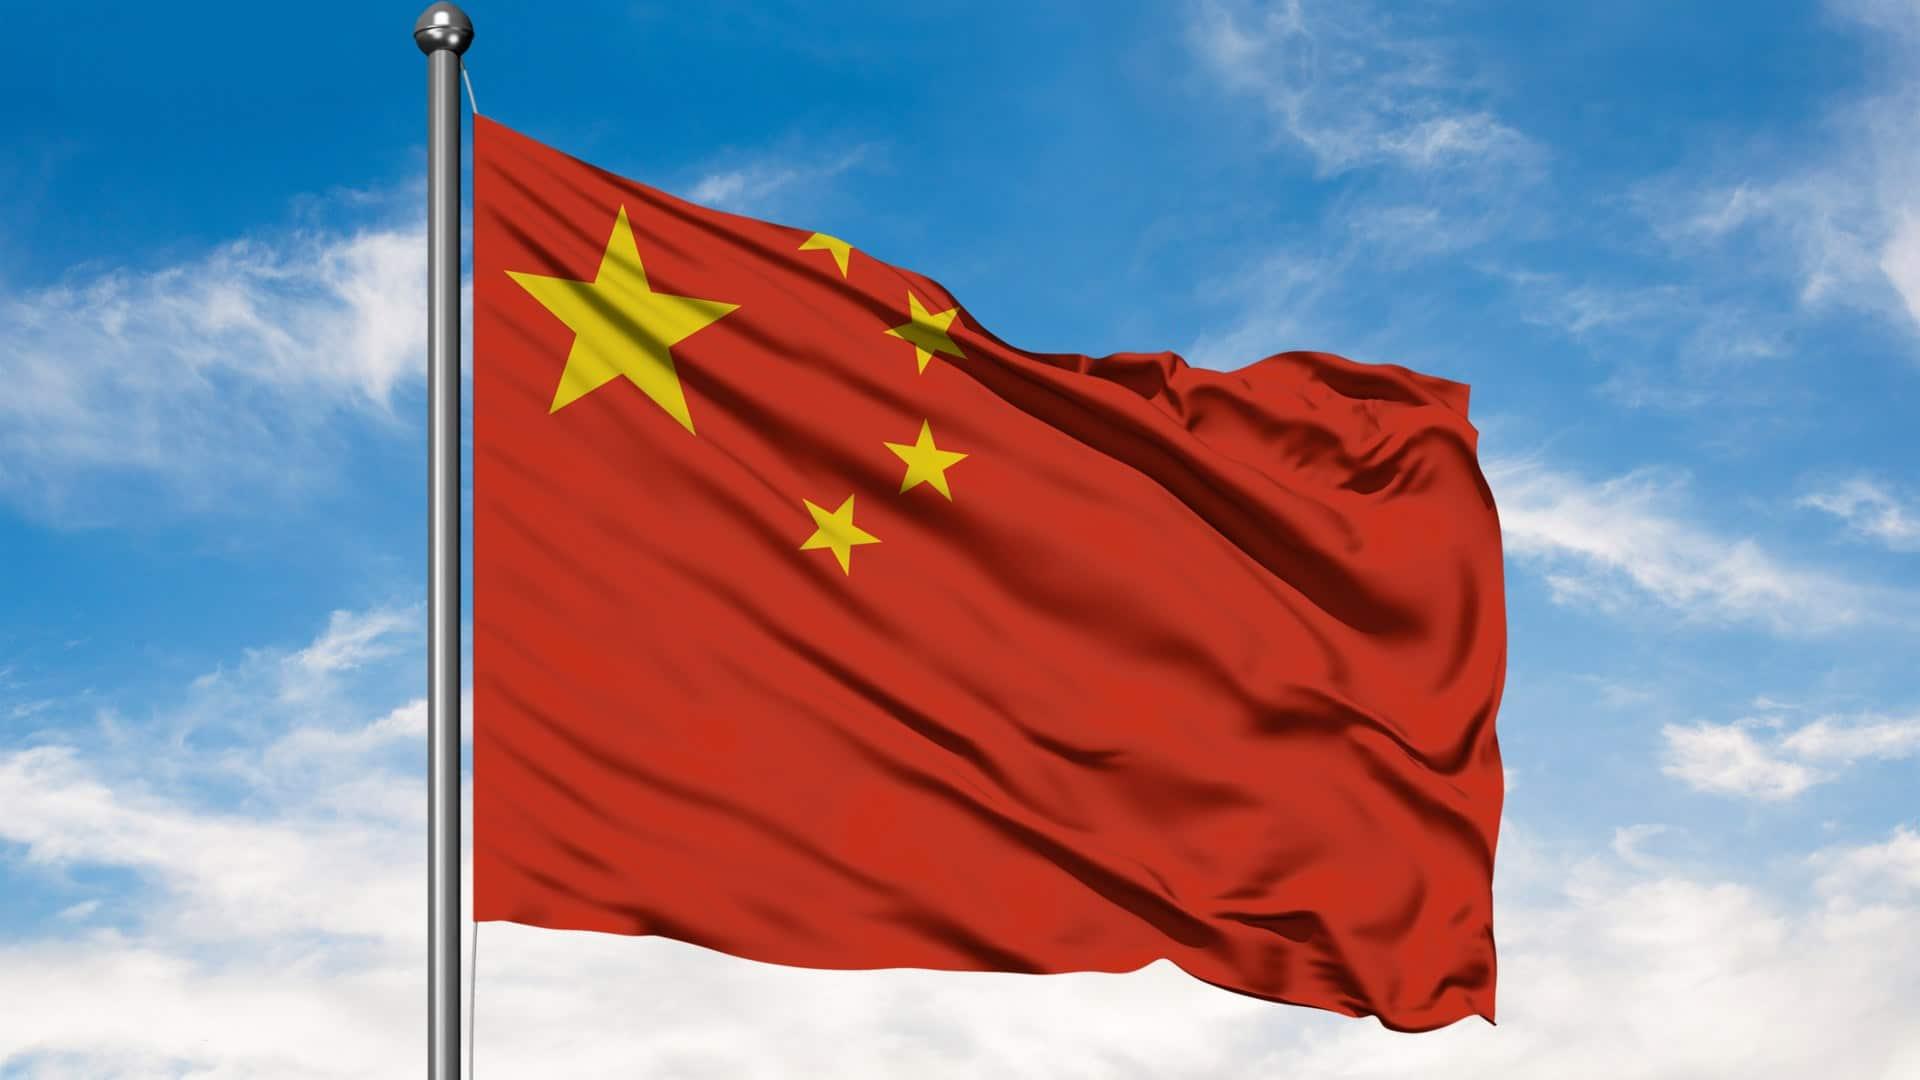 Cina: iniziano i test per la valuta digitale a Shenzhen e Suzhou